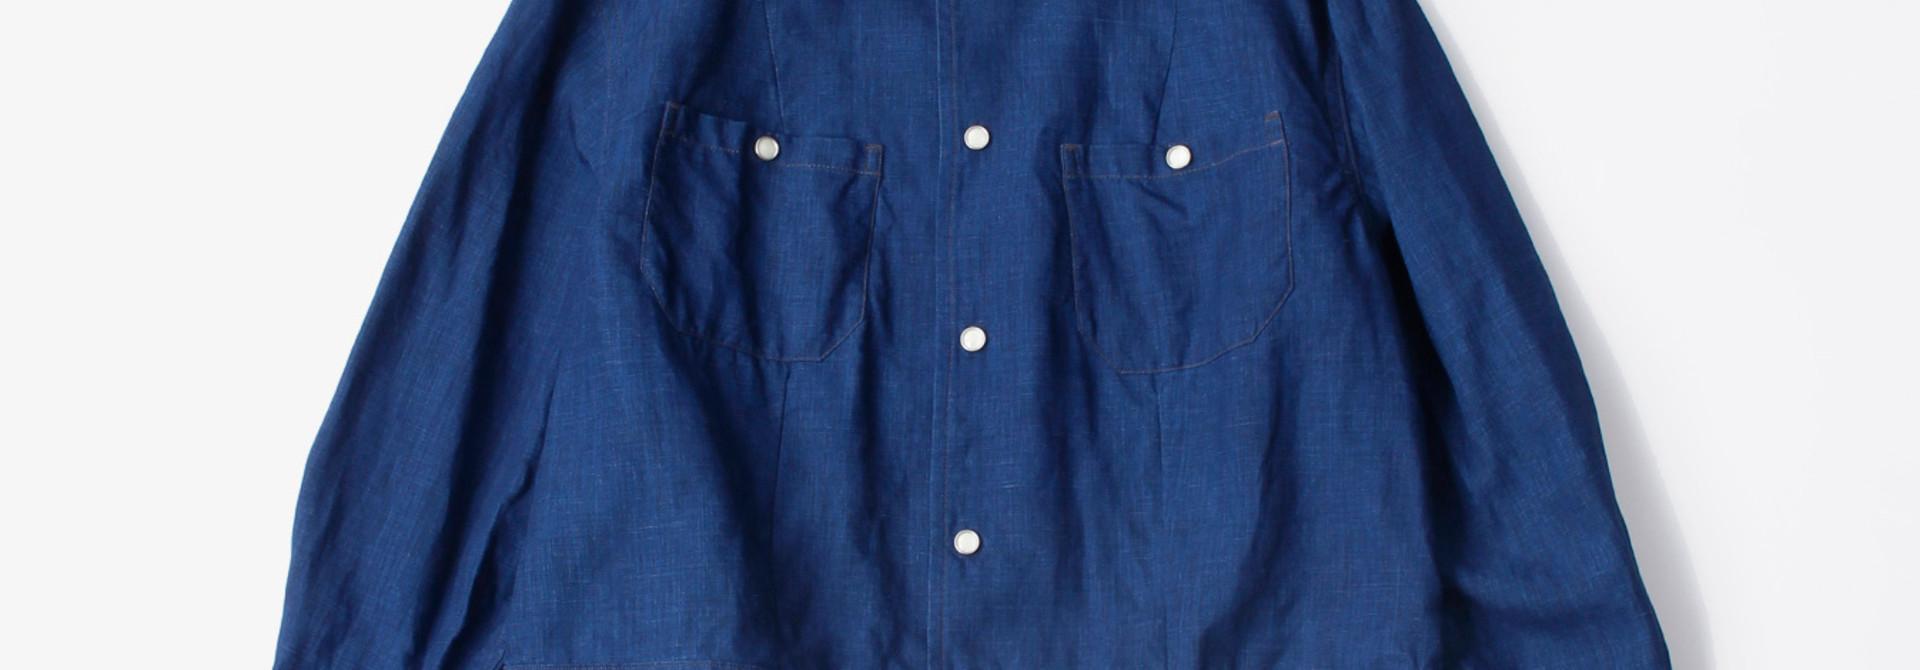 WH Indigo Linen Jean Jacket Bolero